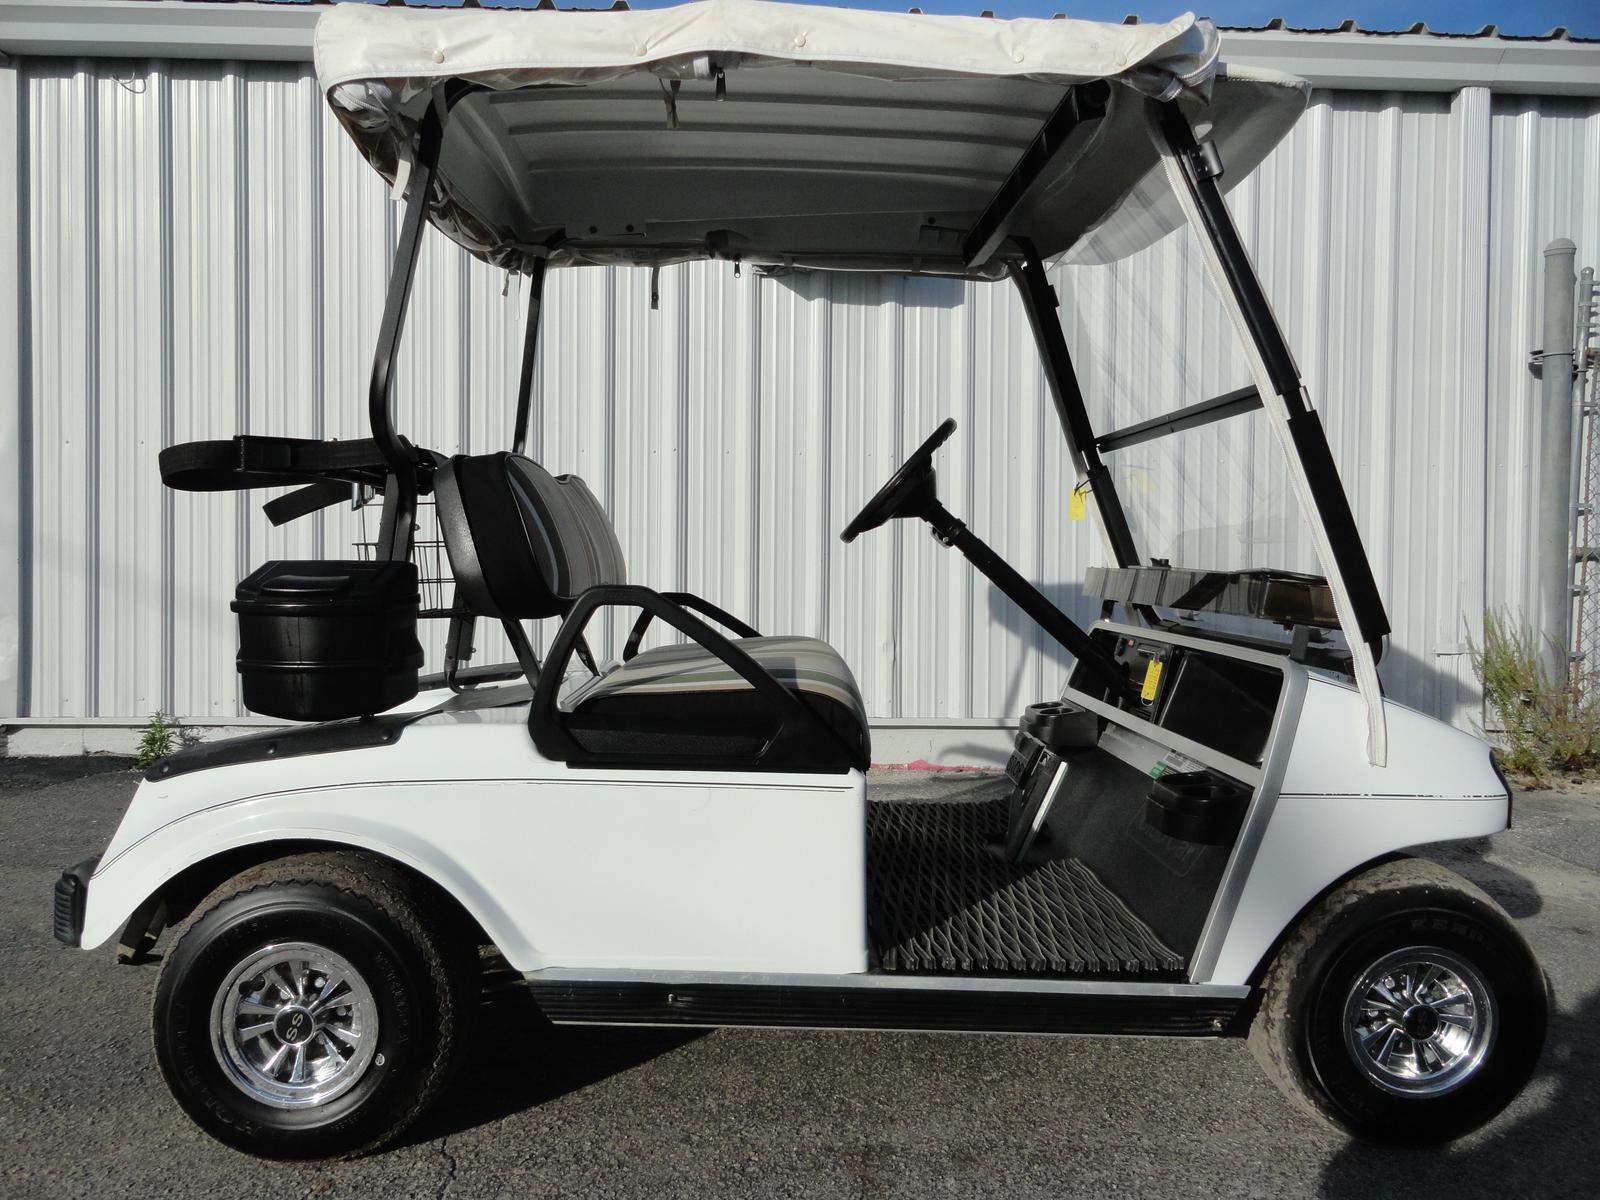 Club Car Electric Golf Cart For Sale In Longwood Fl Prime